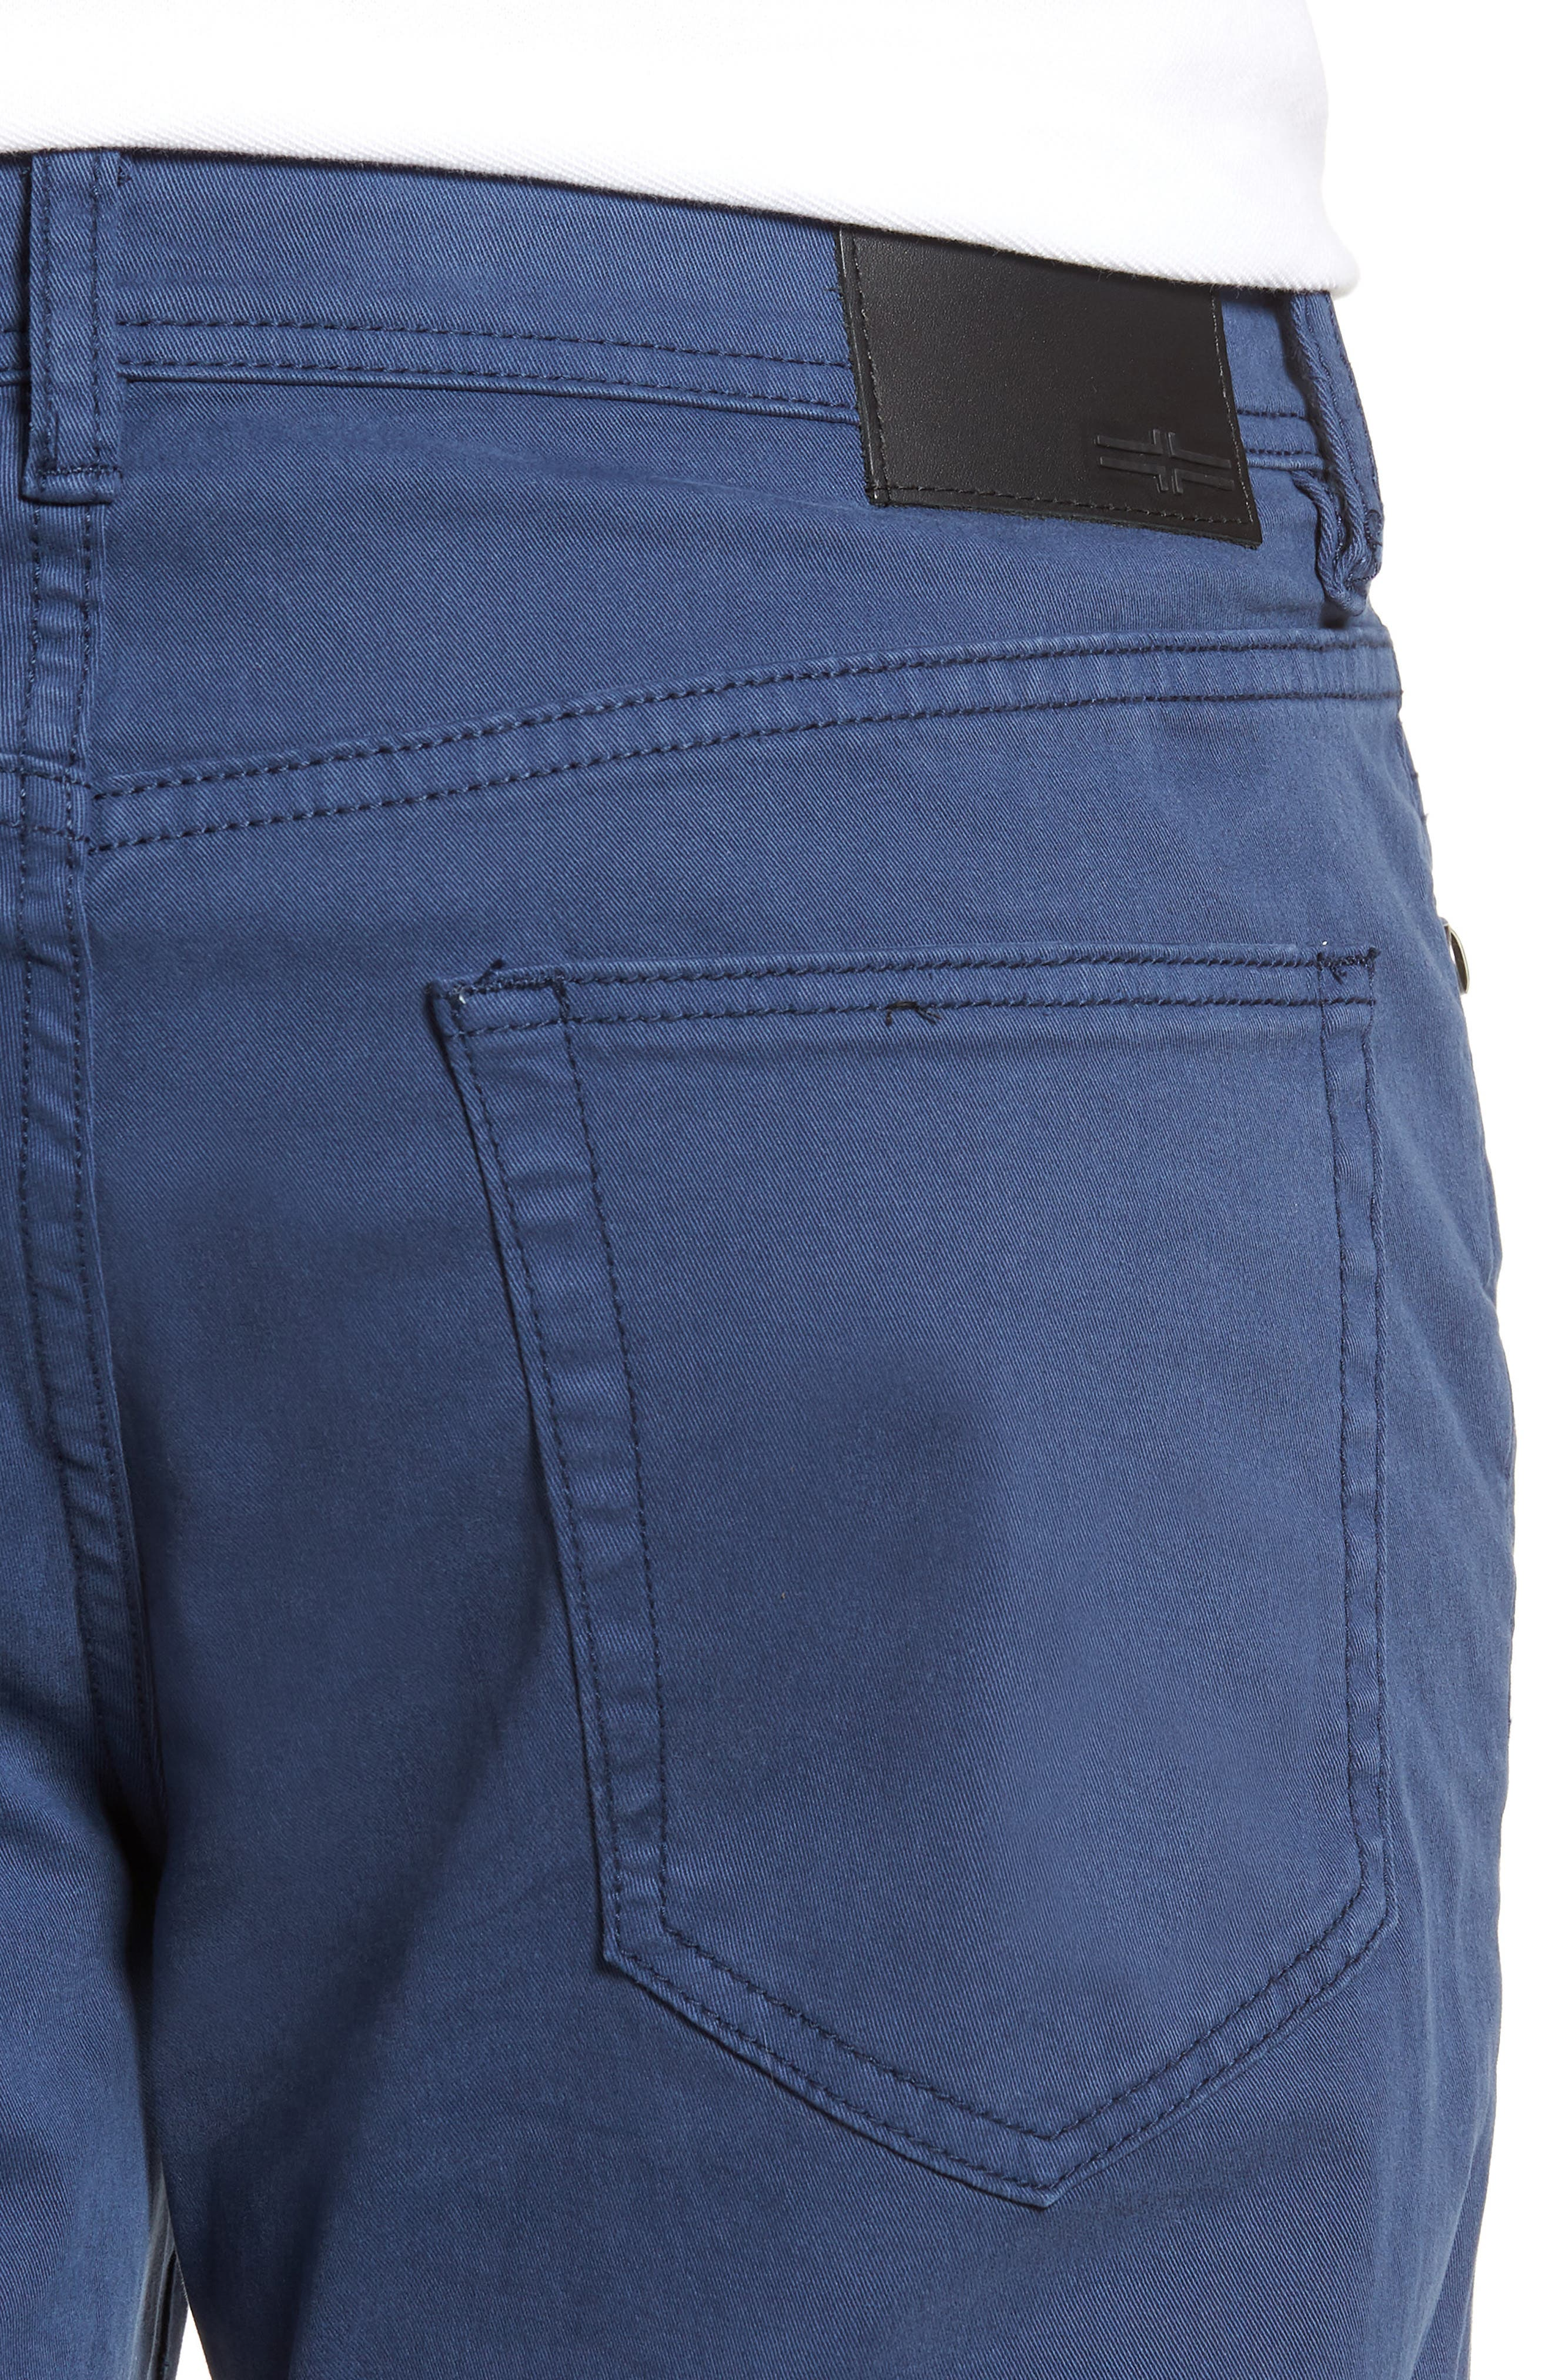 Jeans Co. Regent Relaxed Straight Leg Jeans,                             Alternate thumbnail 4, color,                             BLUE TWILIGHT